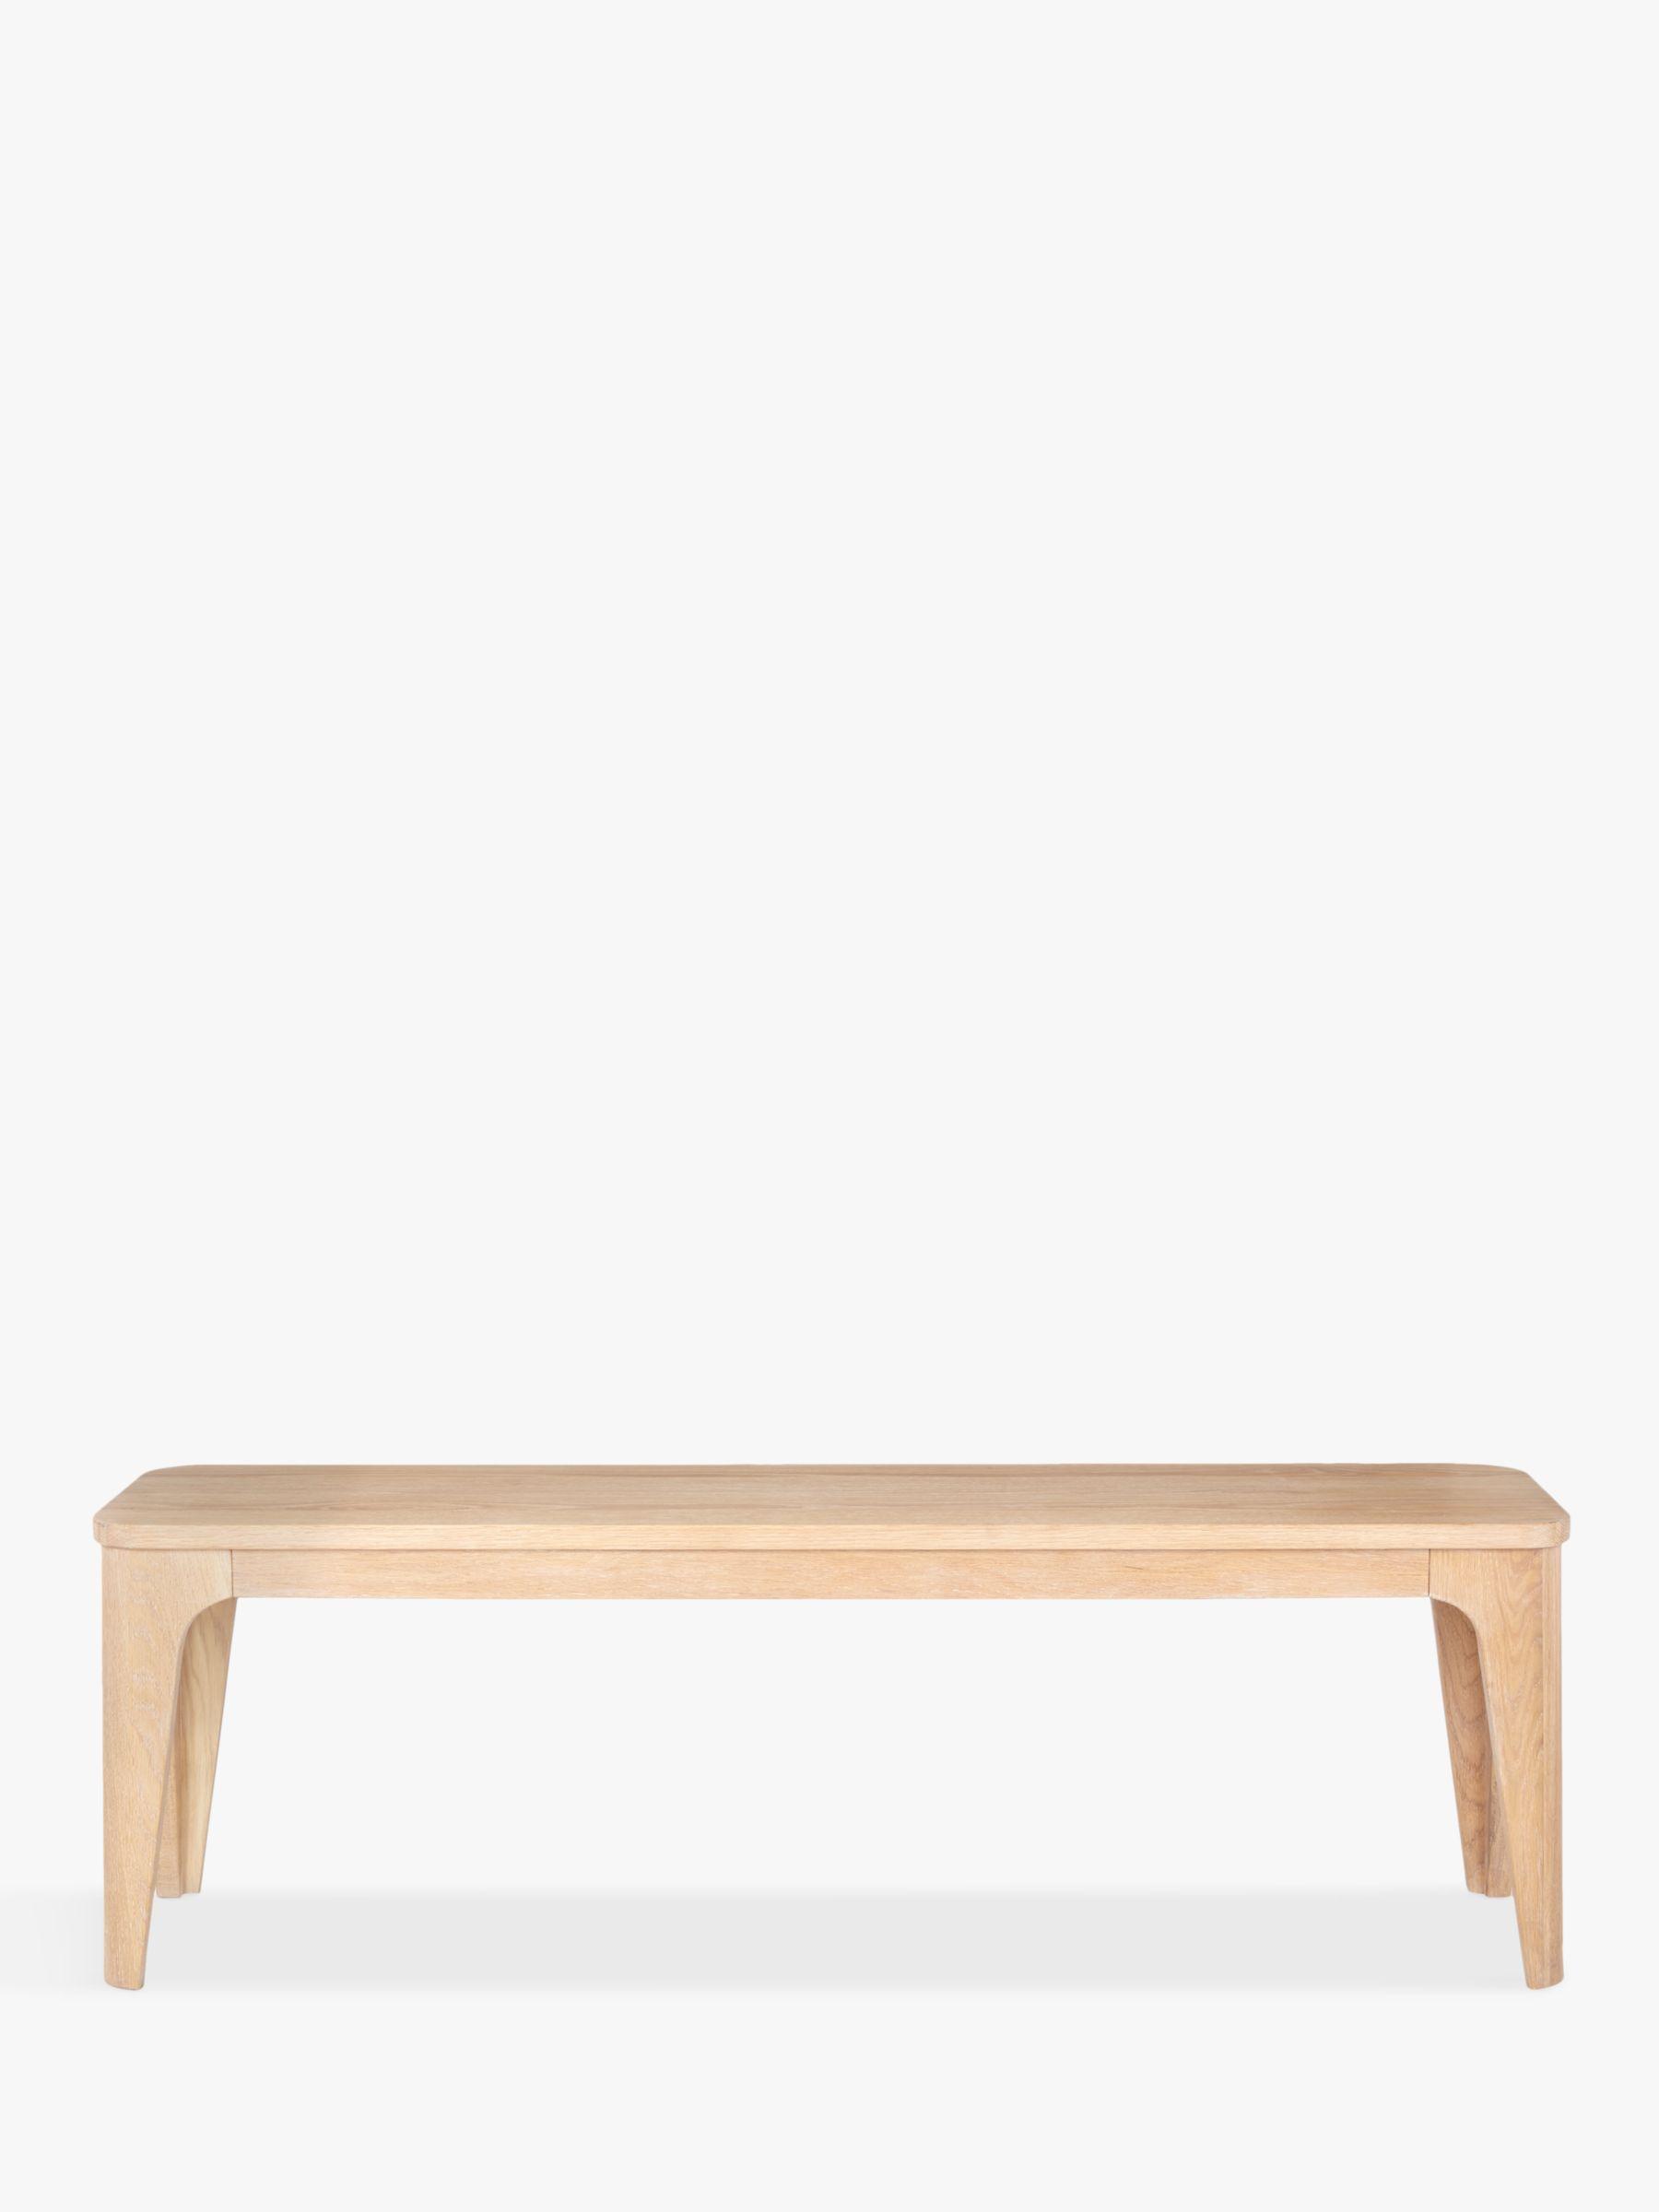 Ebbe Gehl For John Lewis Mira 3 Seater Dining Bench Oak Oak